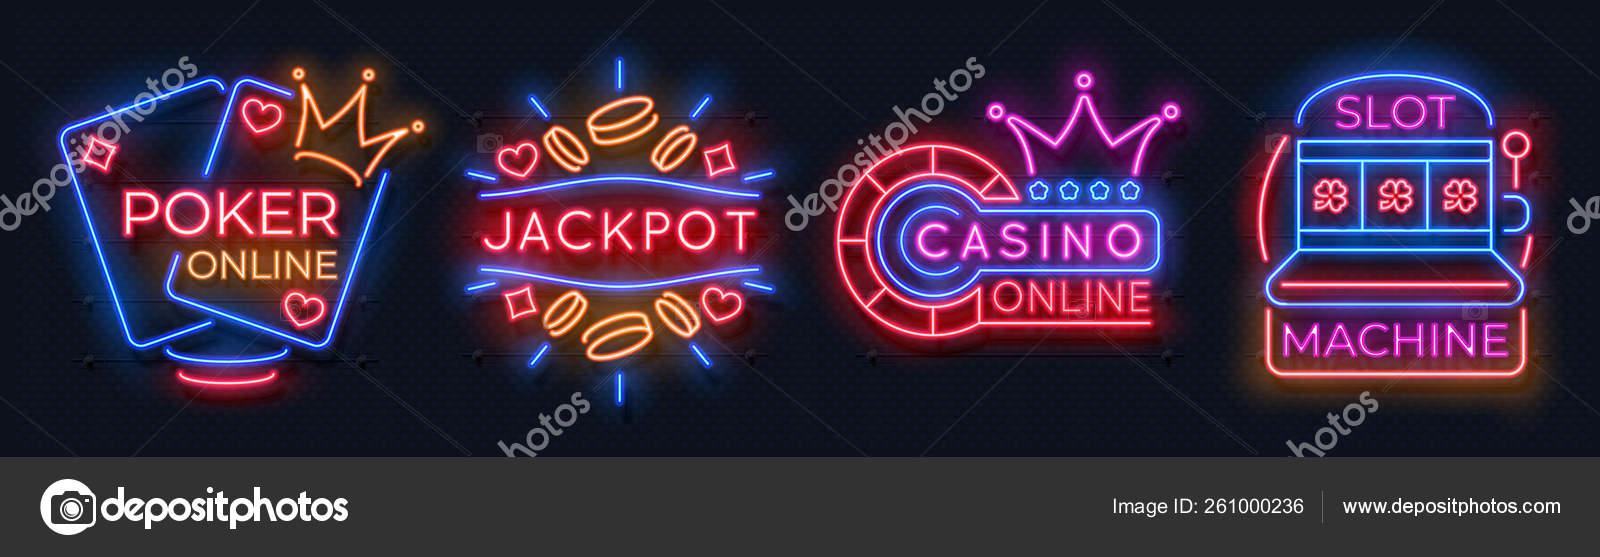 Slot machine online poker 190829